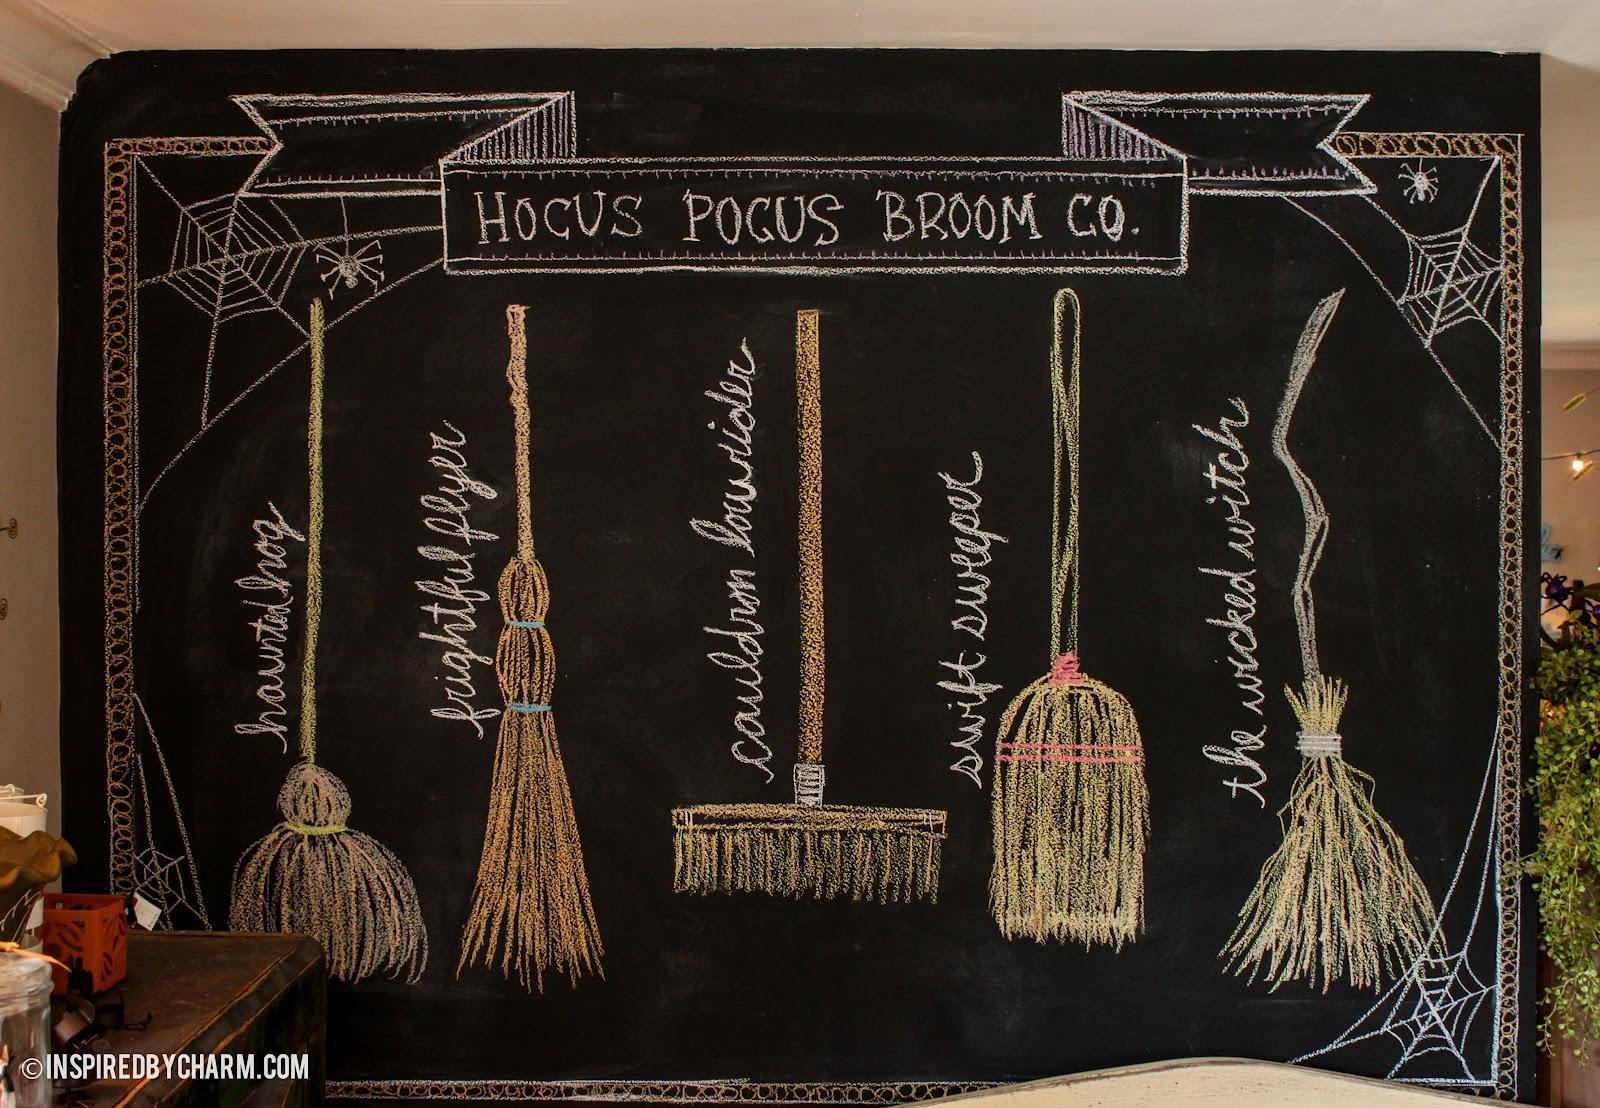 Hocus Pocus Broom Co - Cool chalkboard halloween decor